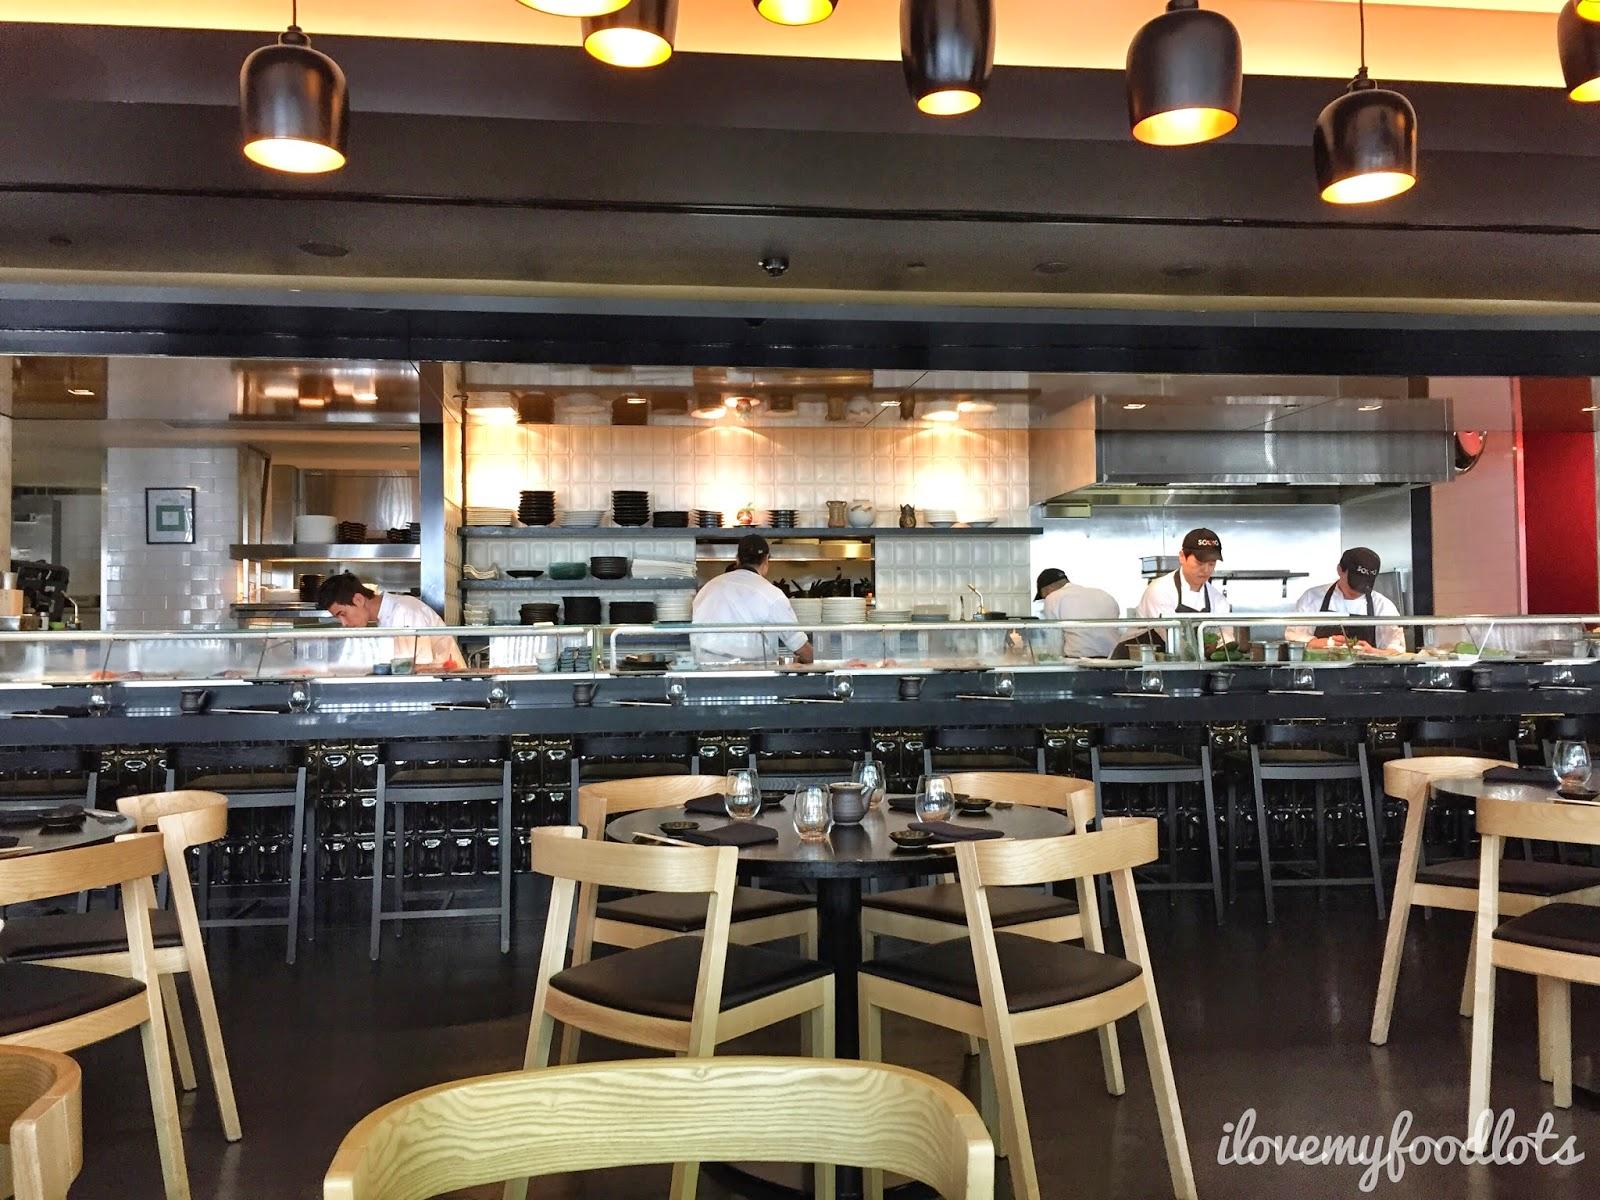 ilovemyfoodlots sokyo japanese restaurant pyrmont. Black Bedroom Furniture Sets. Home Design Ideas